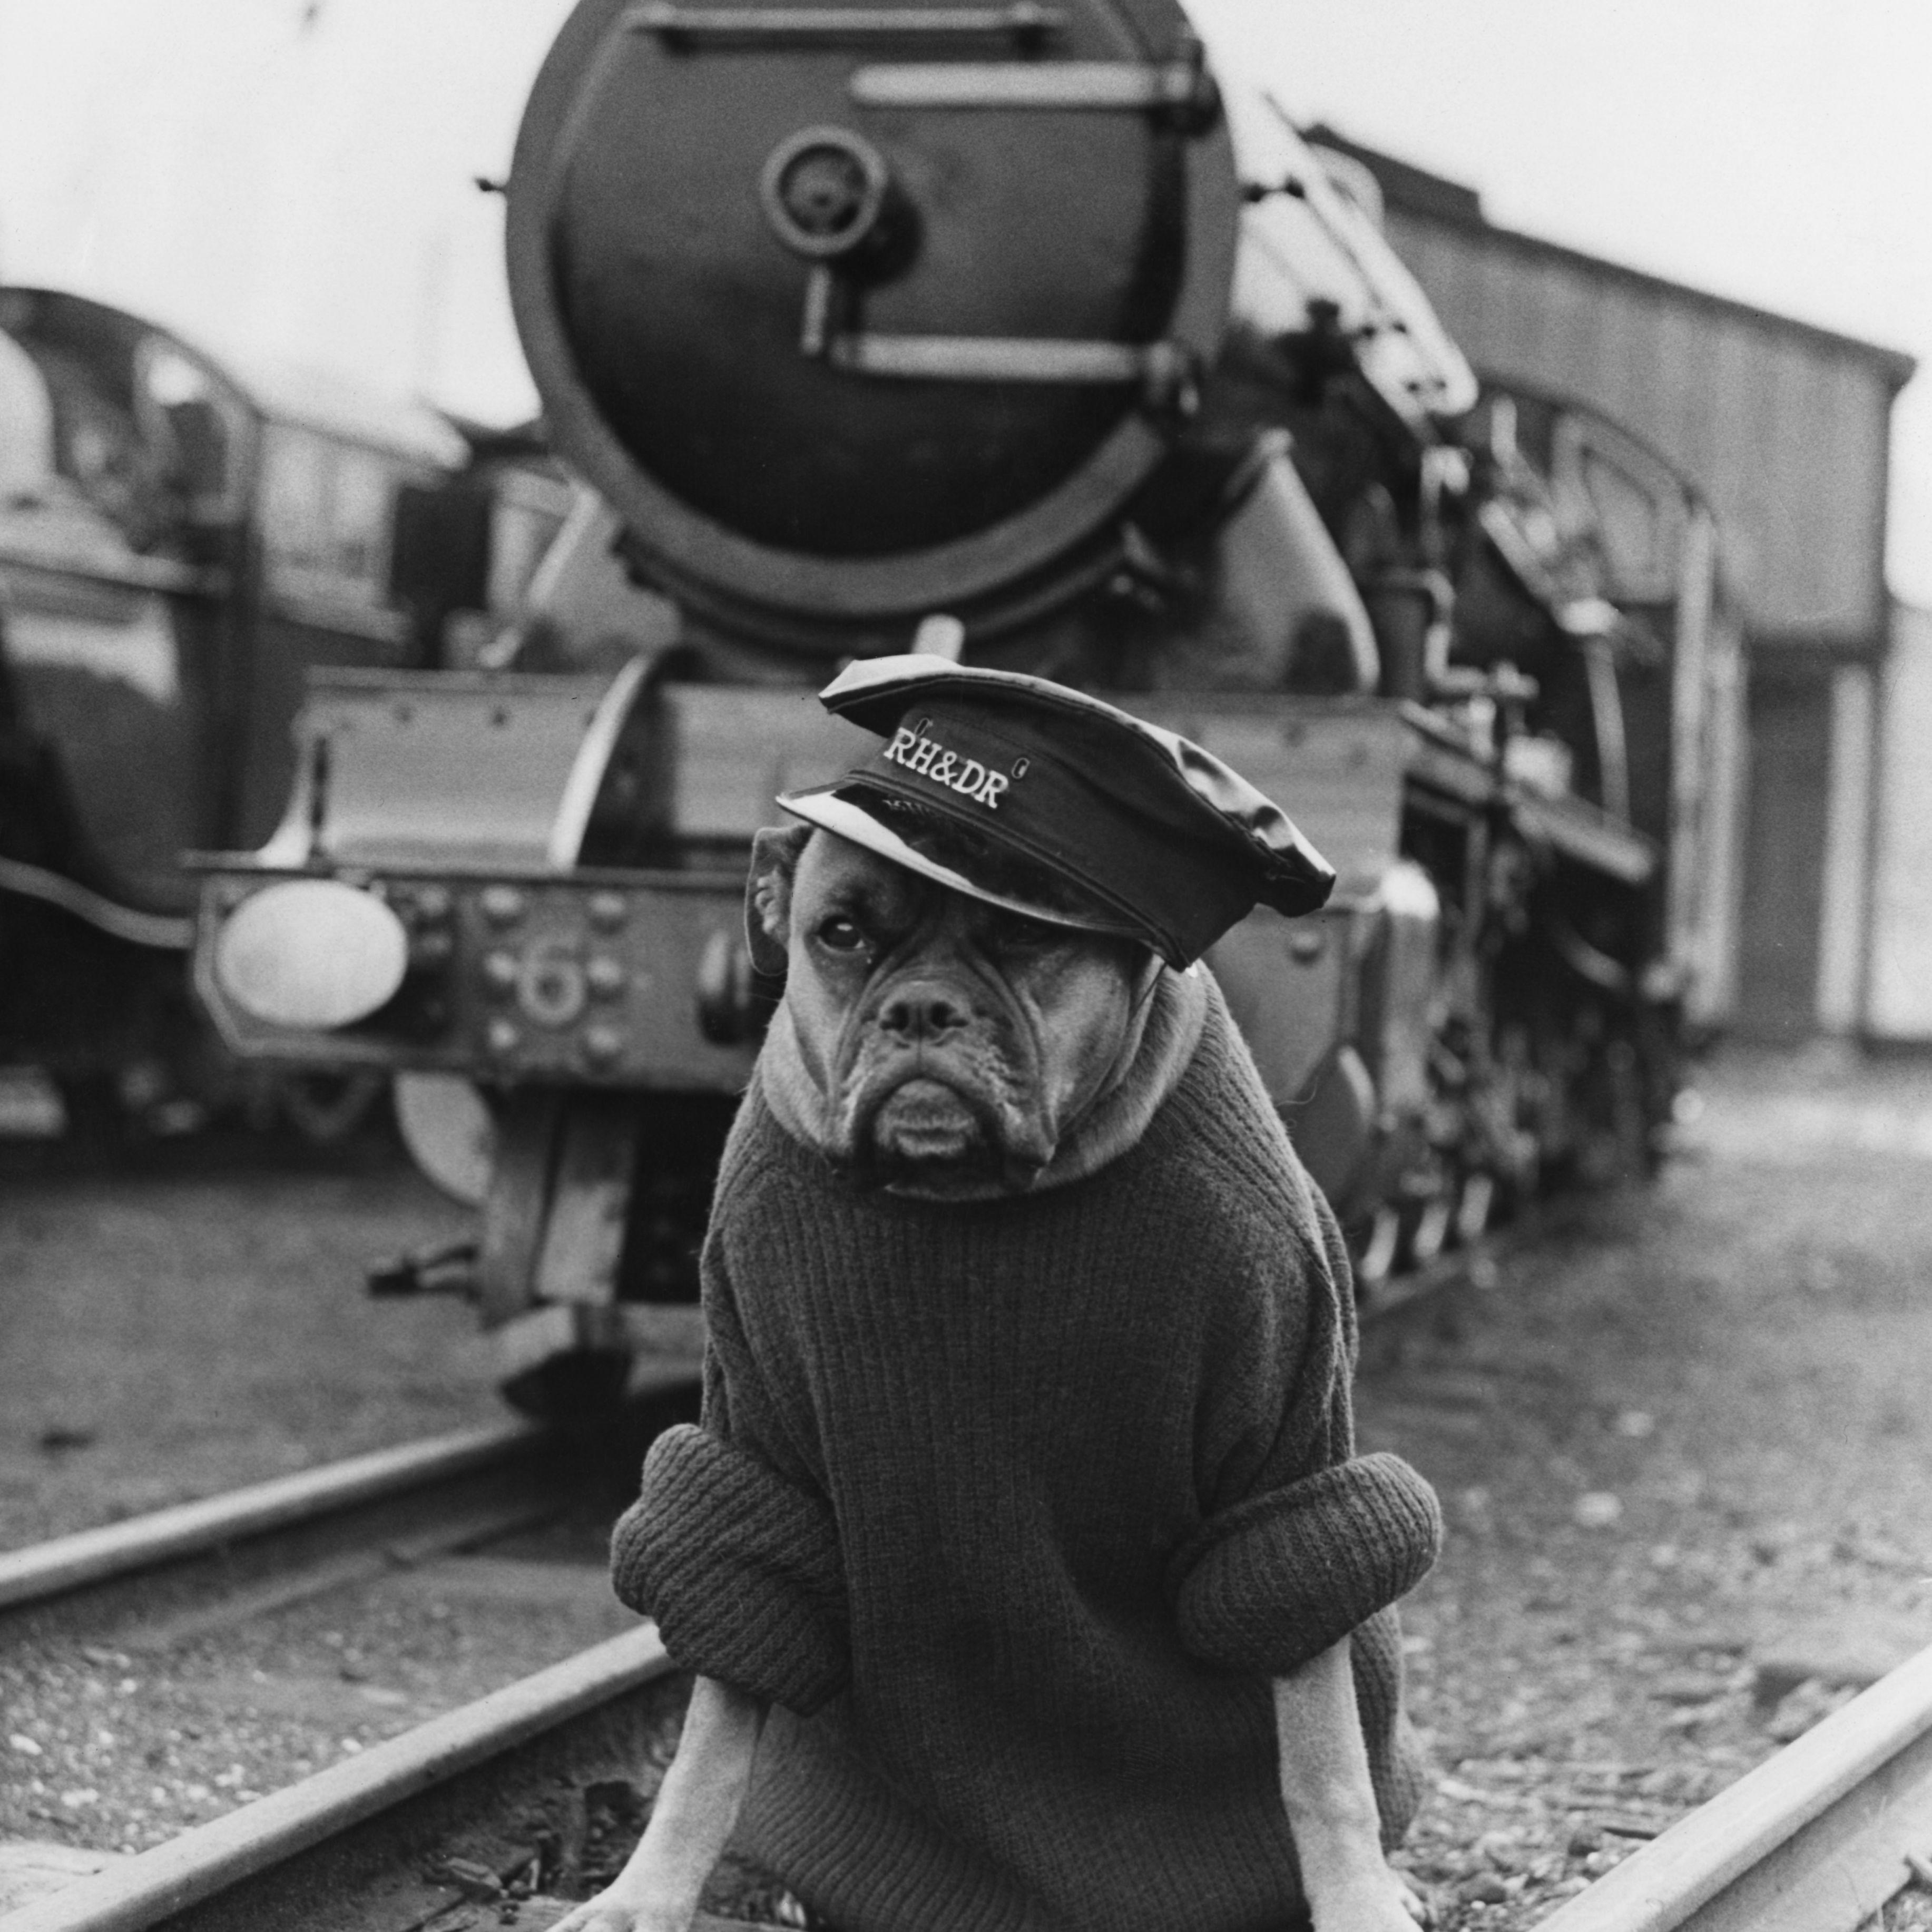 Railway guard dog